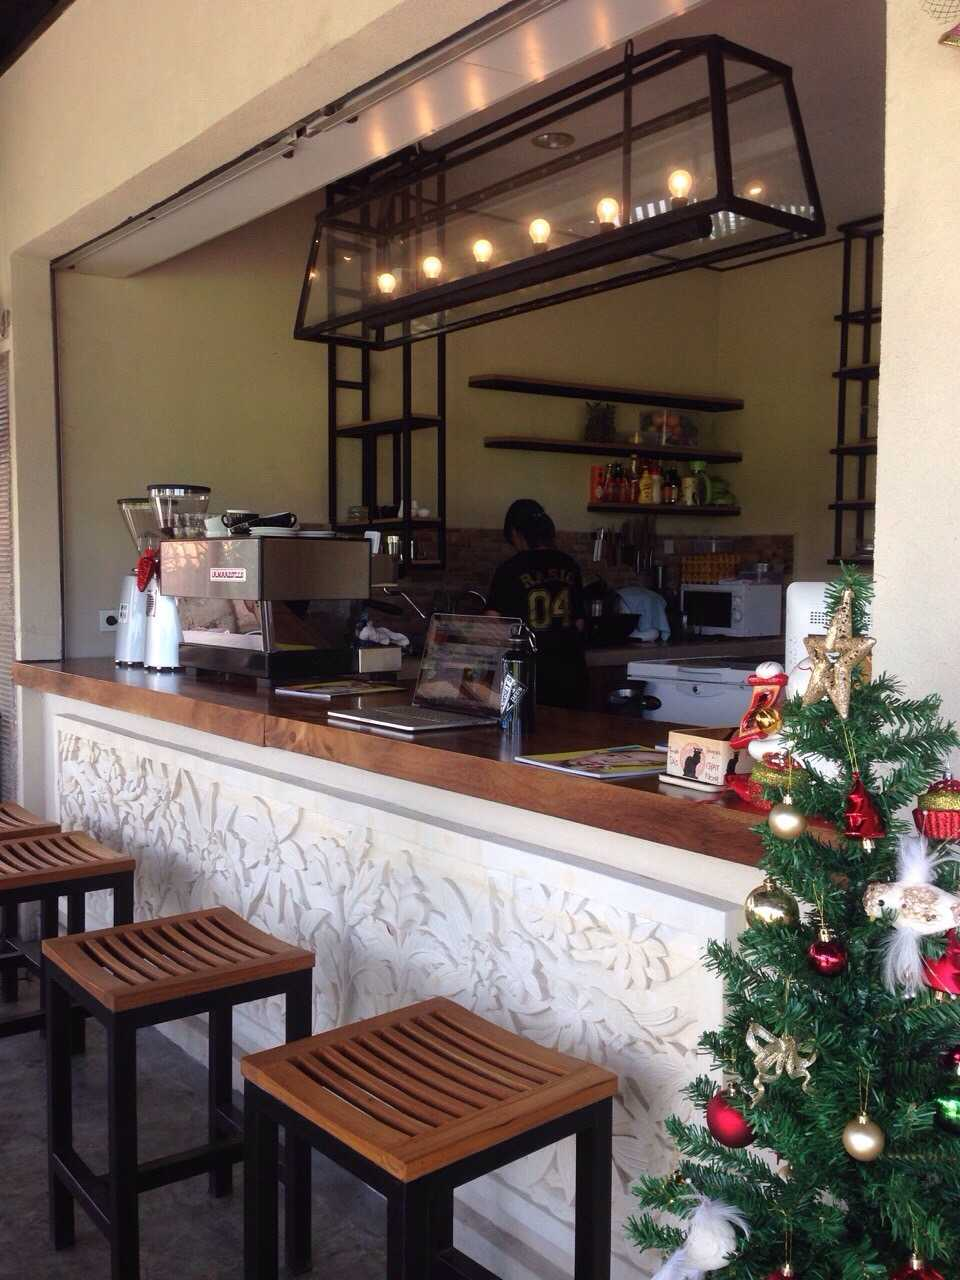 Erlyne Puspa Jayani Ciputra Rasio Coffee Bali Bali Bali Rasio-8  28646